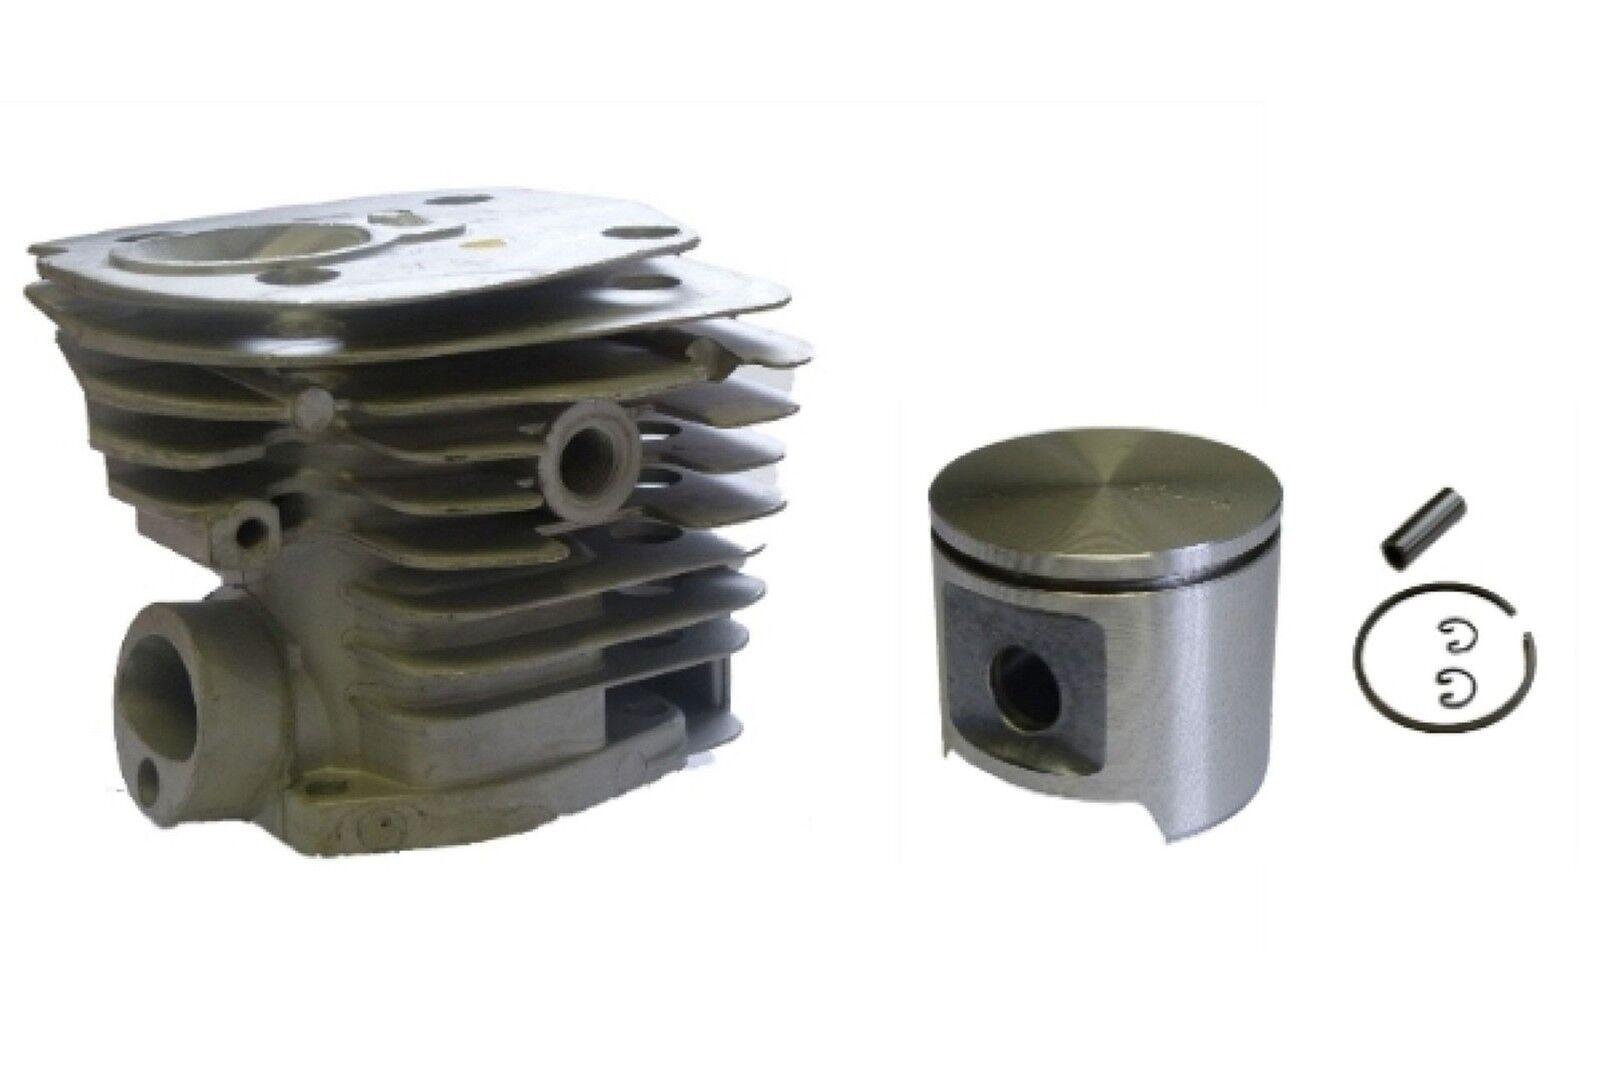 Kolben Zylinder passend Husqvarna 353  44mm motorsäge kettensäge neu